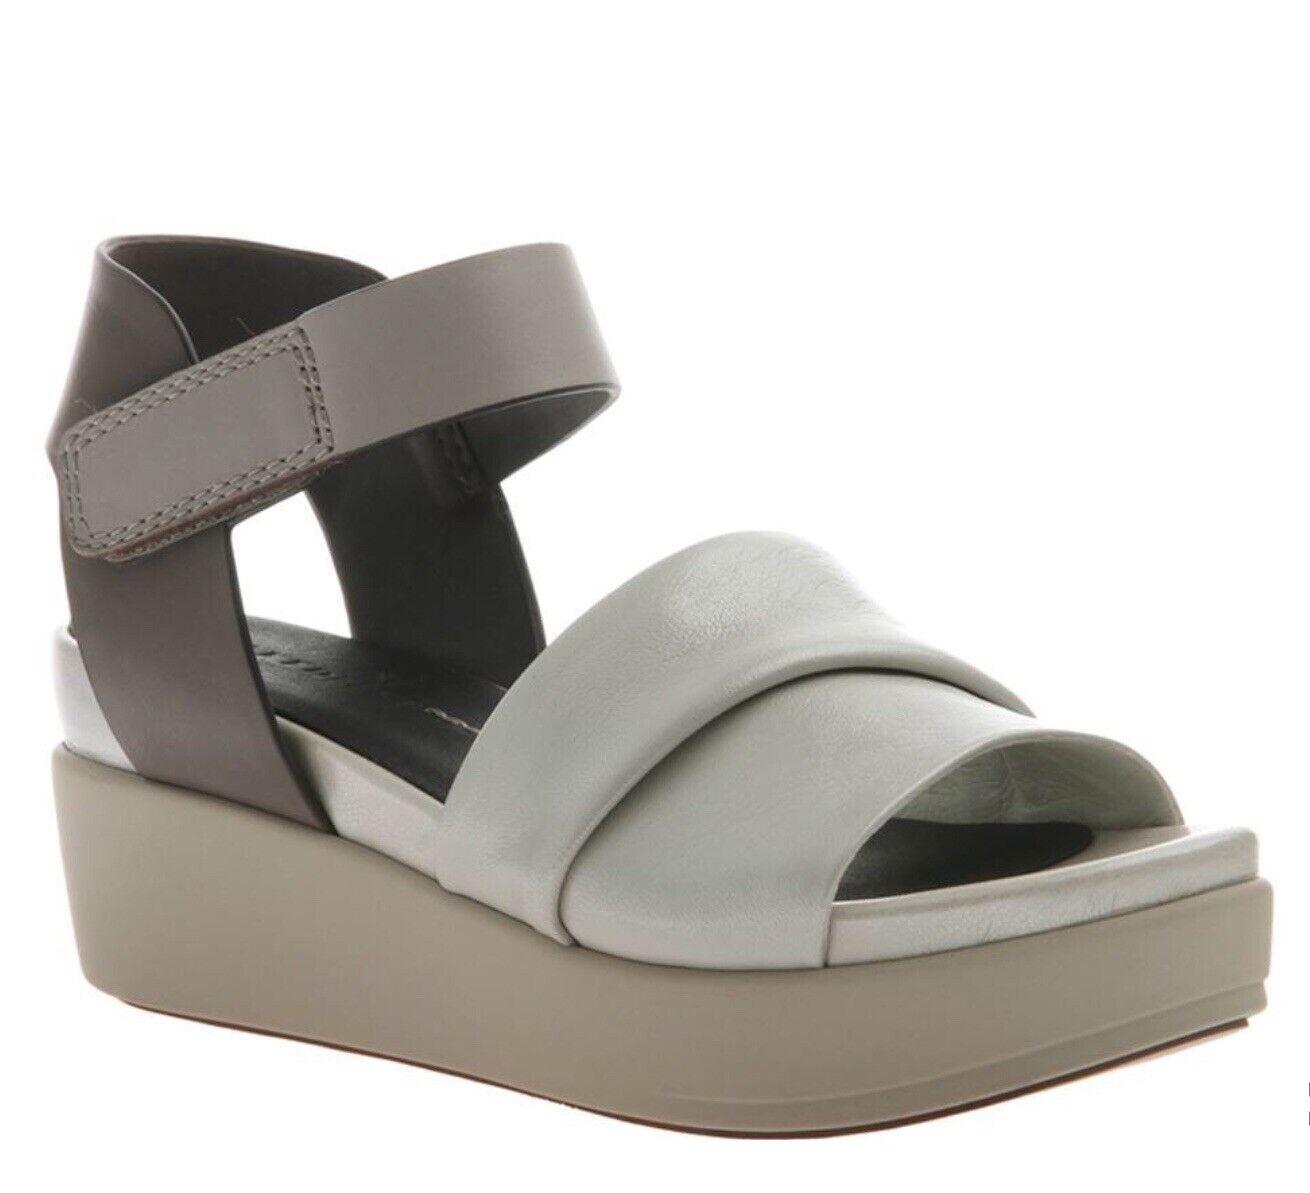 Sandalias Koda de pies desnudos, grises y grises, 9 - 1   2 fehombresino.